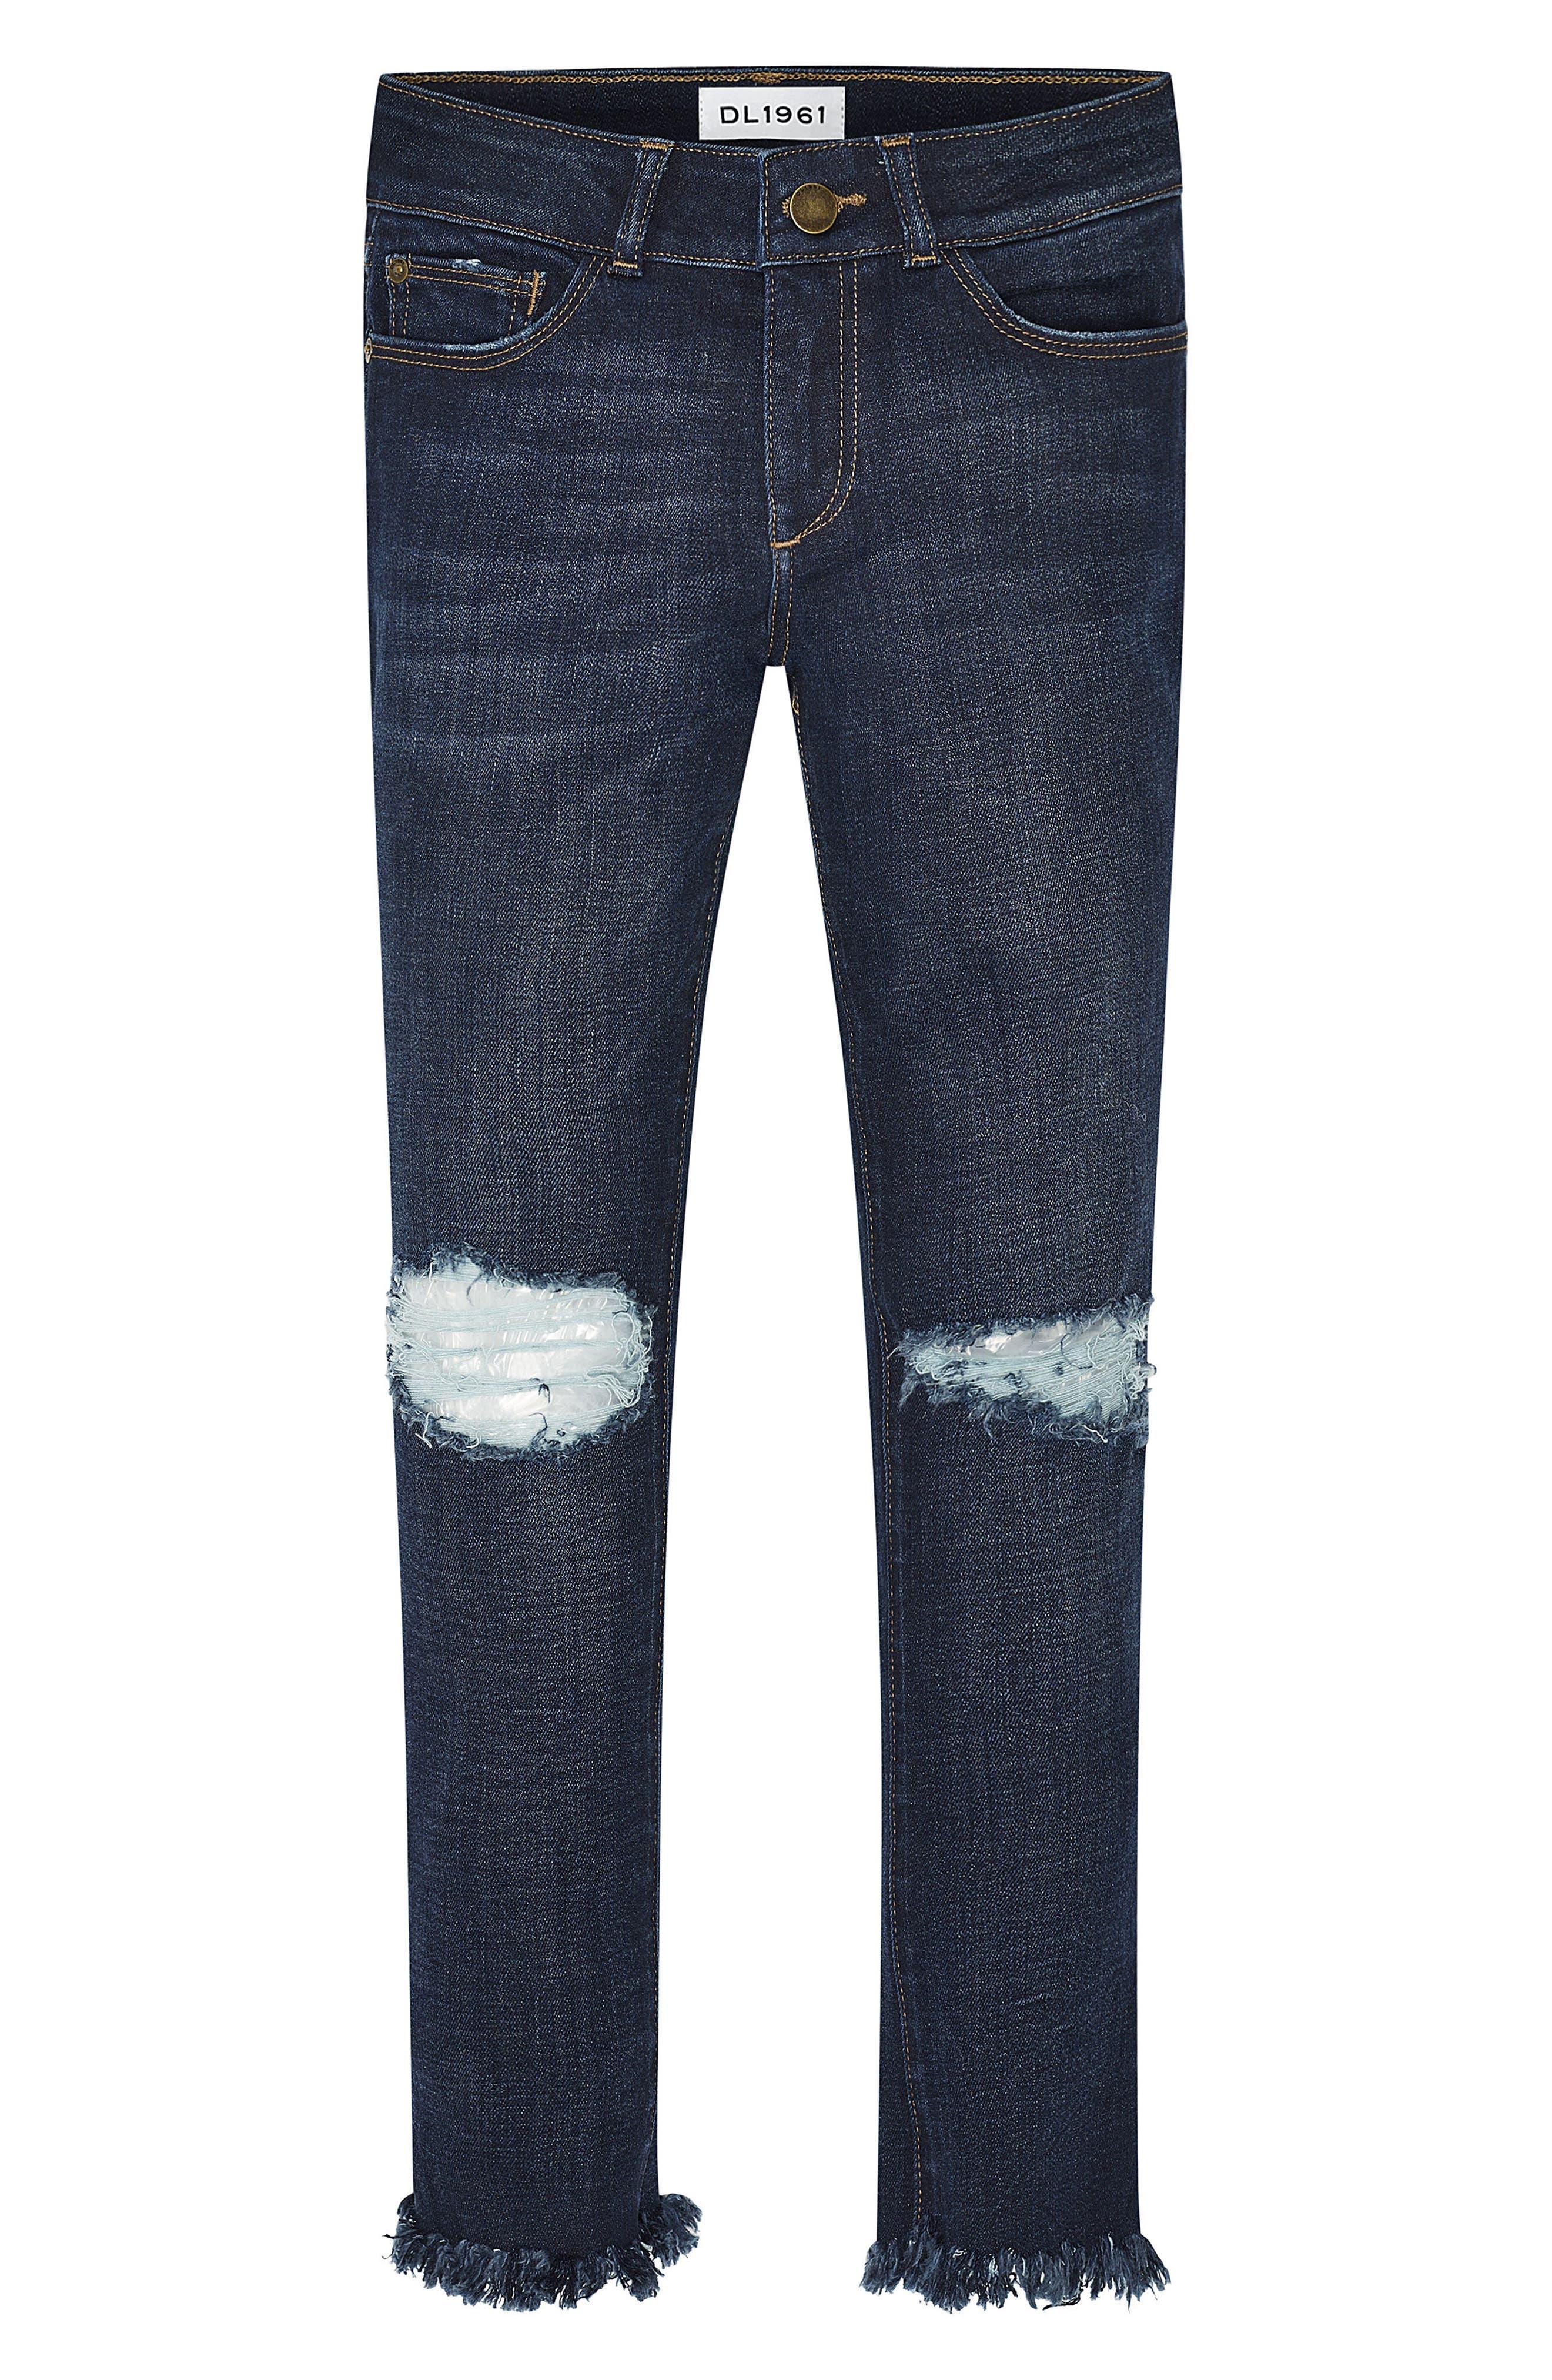 Alternate Image 1 Selected - DL1916 Chloe Distressed Skinny Jeans (Big Girls)